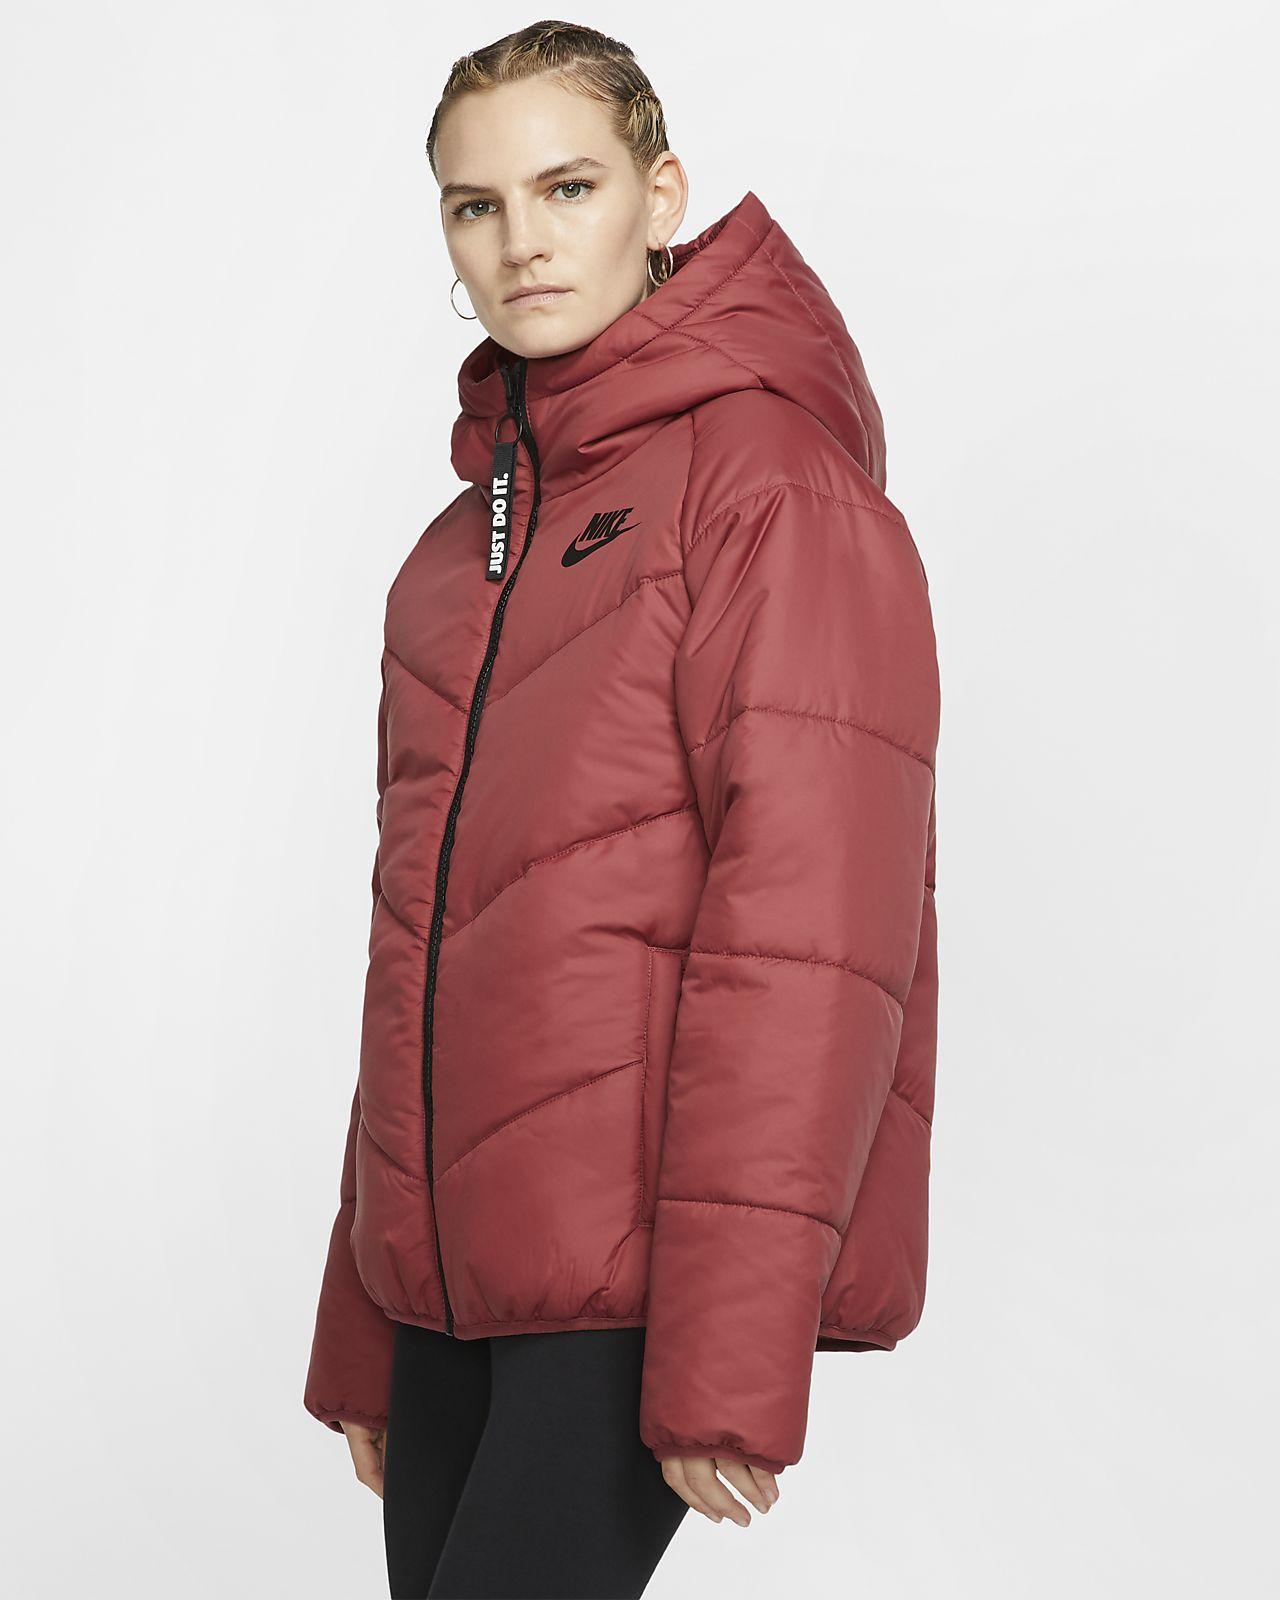 Damska kurtka z kapturem Nike Sportswear Windrunner